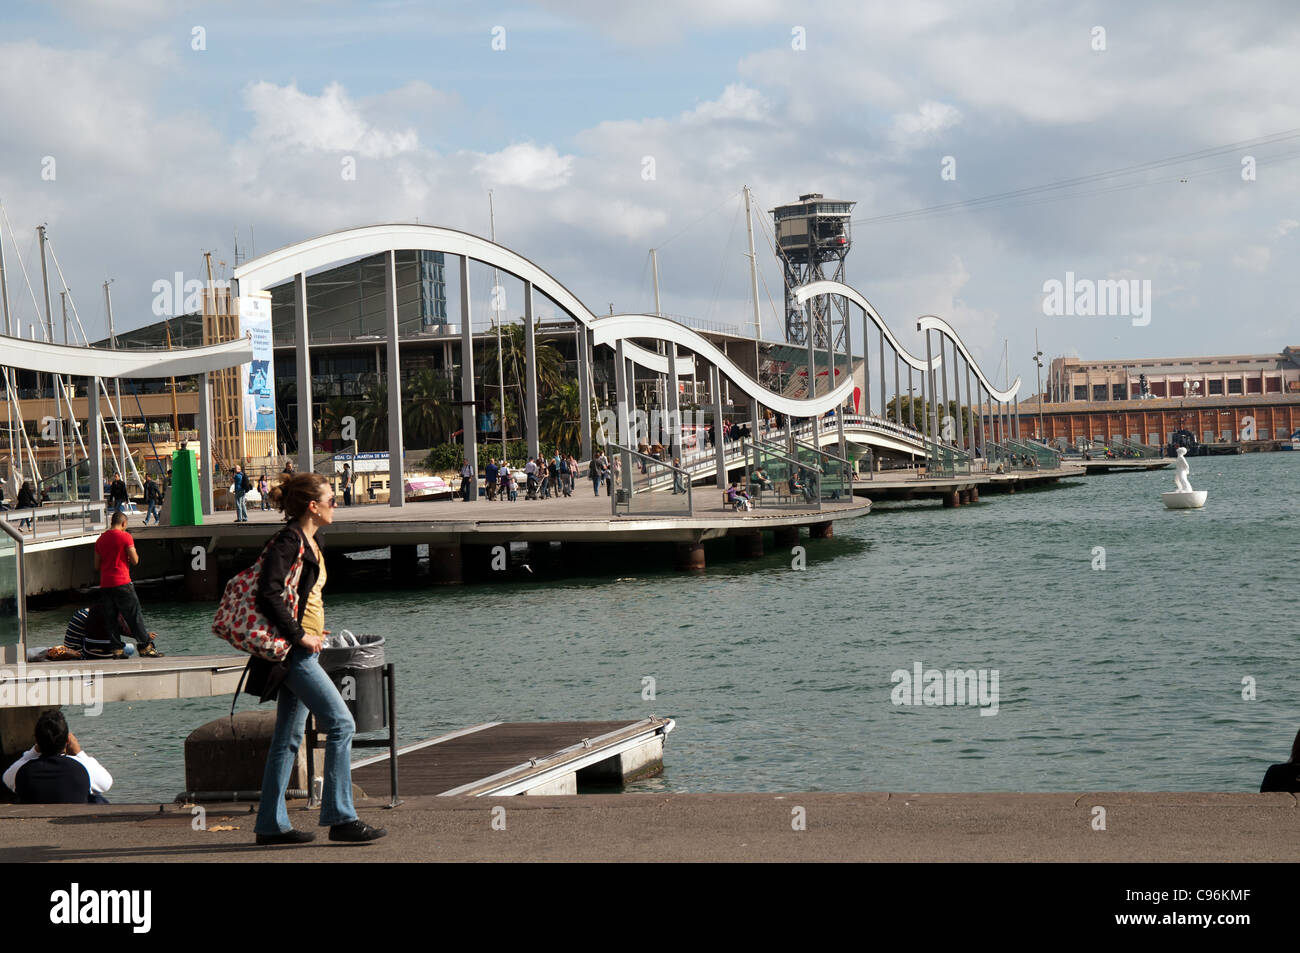 Rambla de Mar, Port Vell, Barcelona, Spain - Stock Image